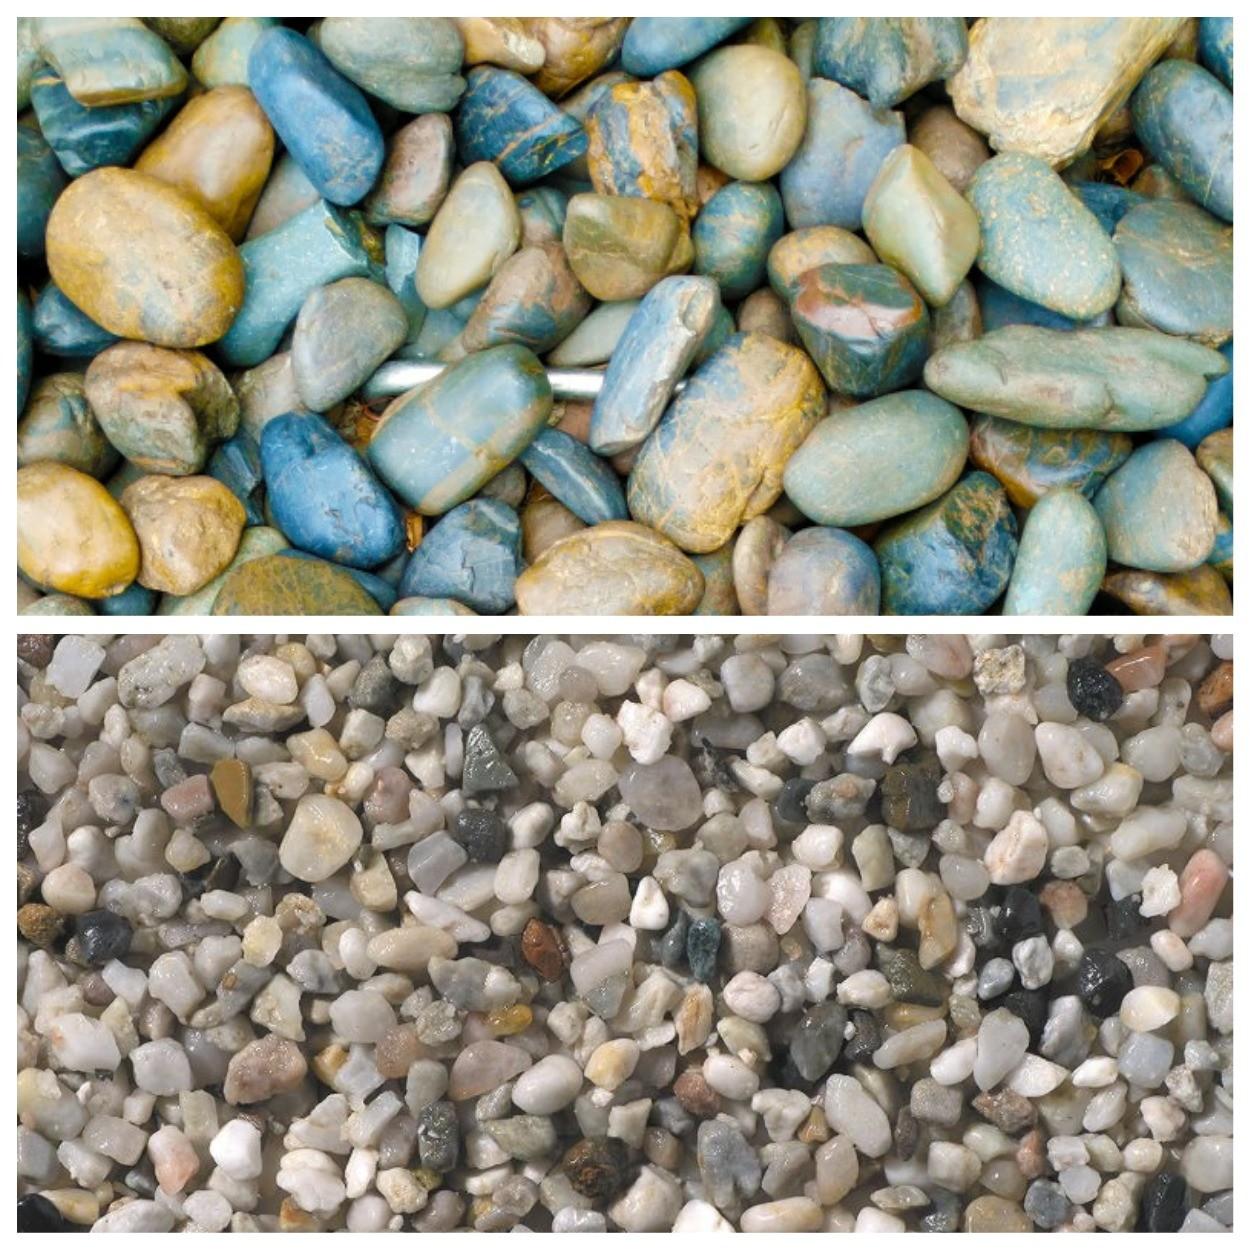 изображение морского и аквариумного камня